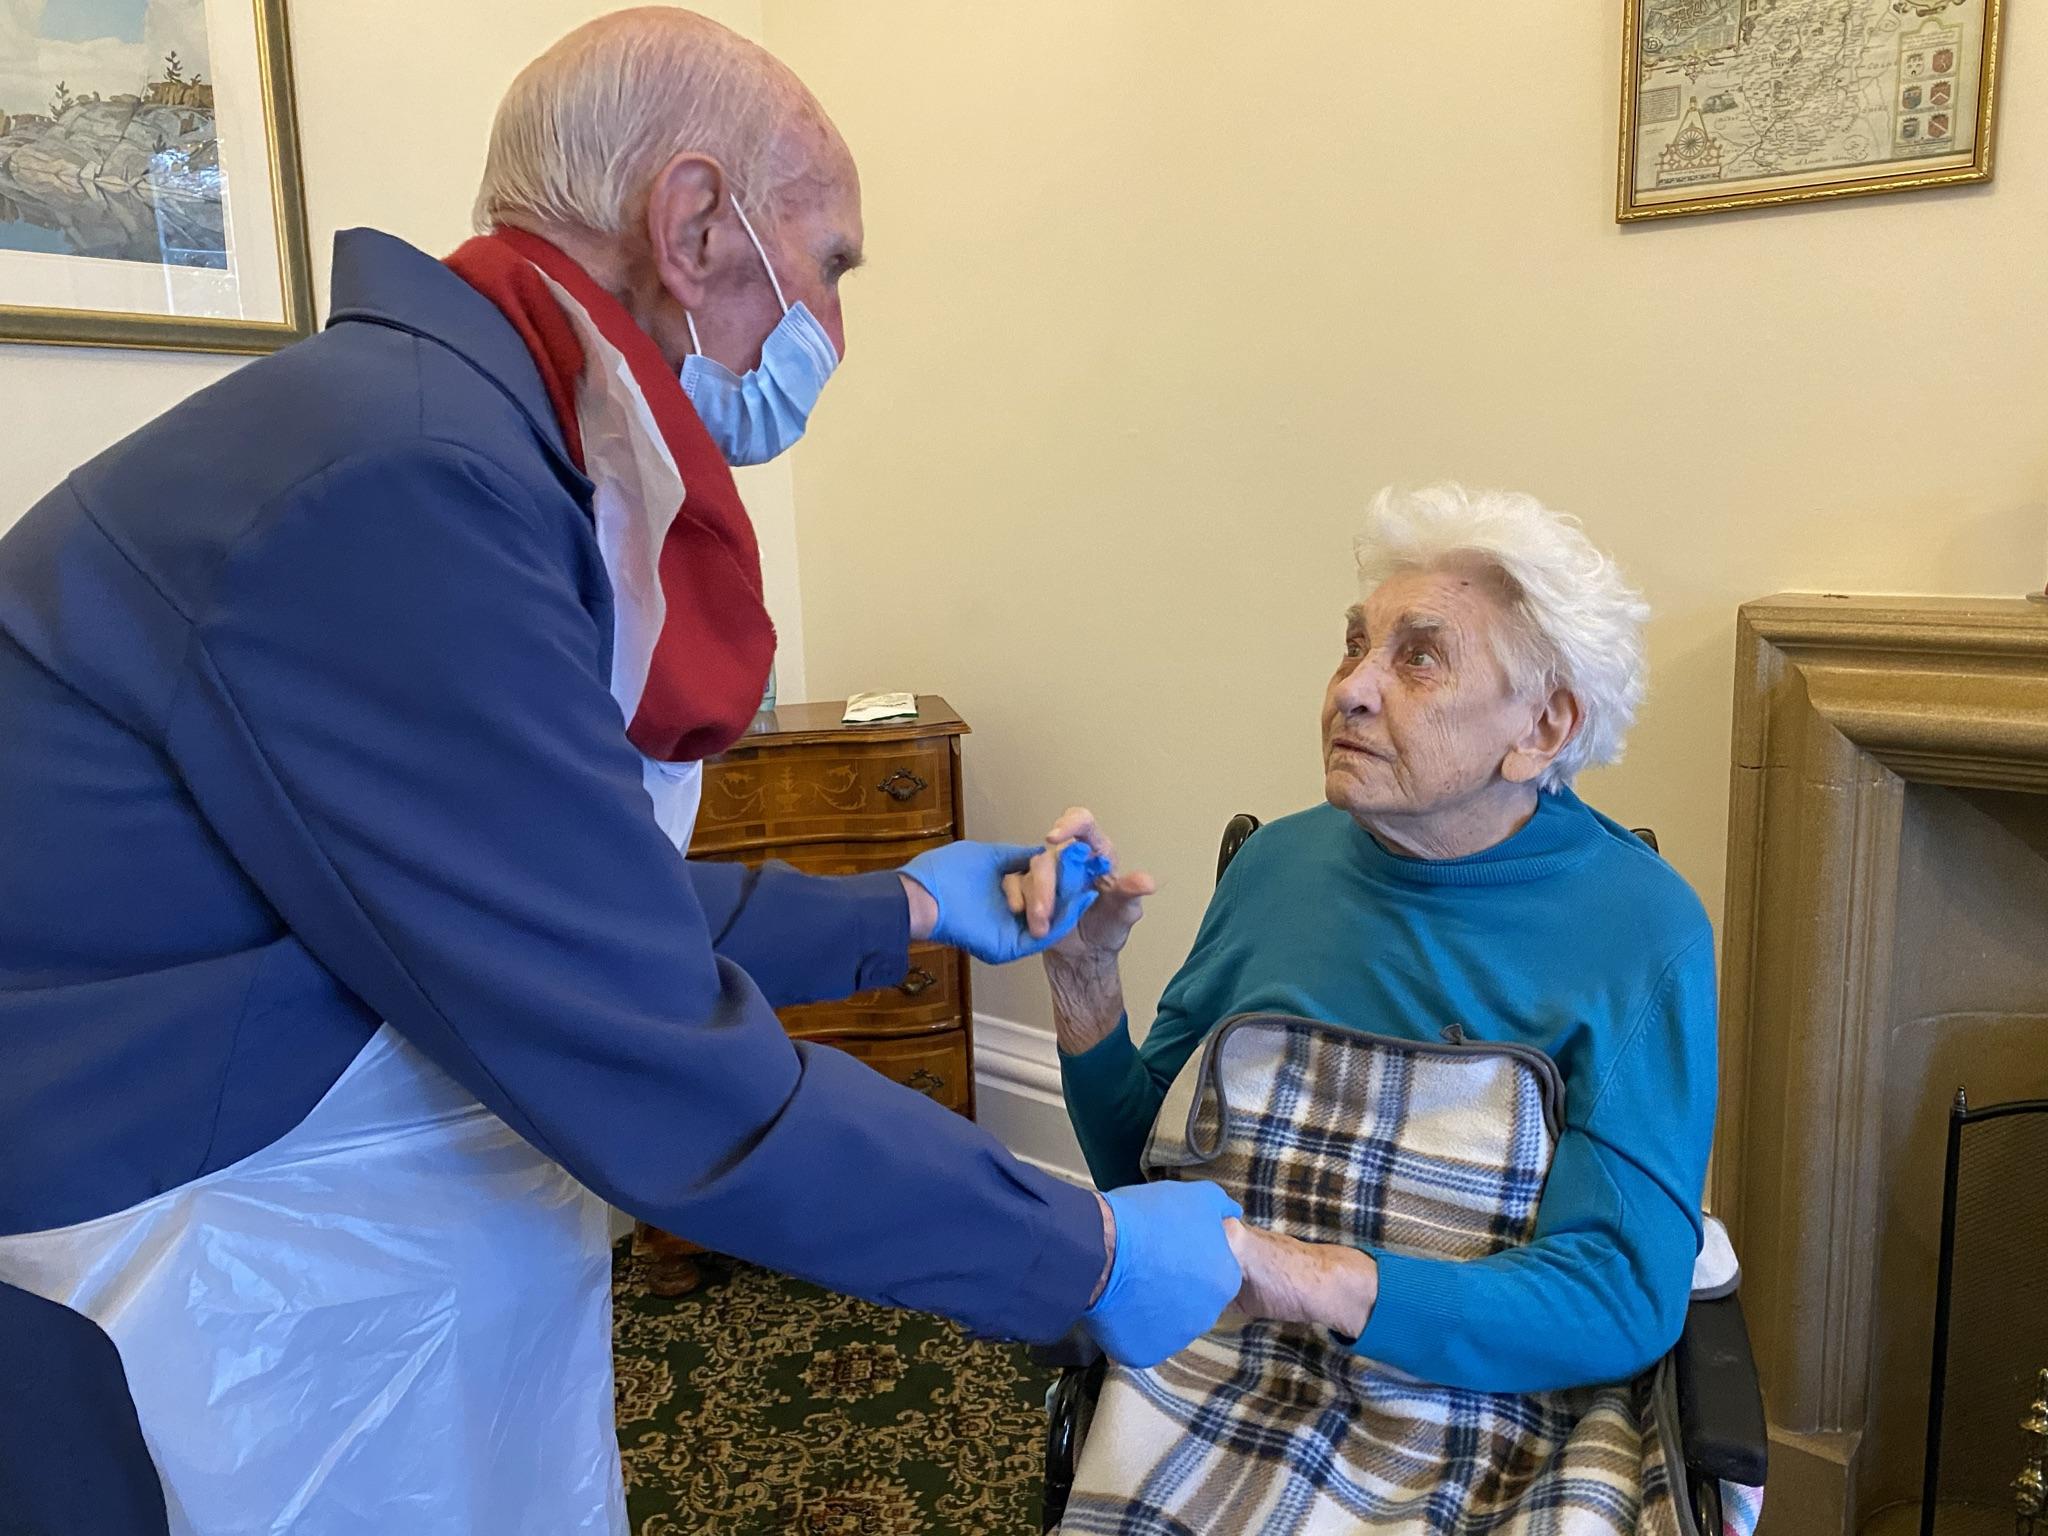 A Husband-Wife Visit Following an LFD COVID-19 Test - 17.12.20